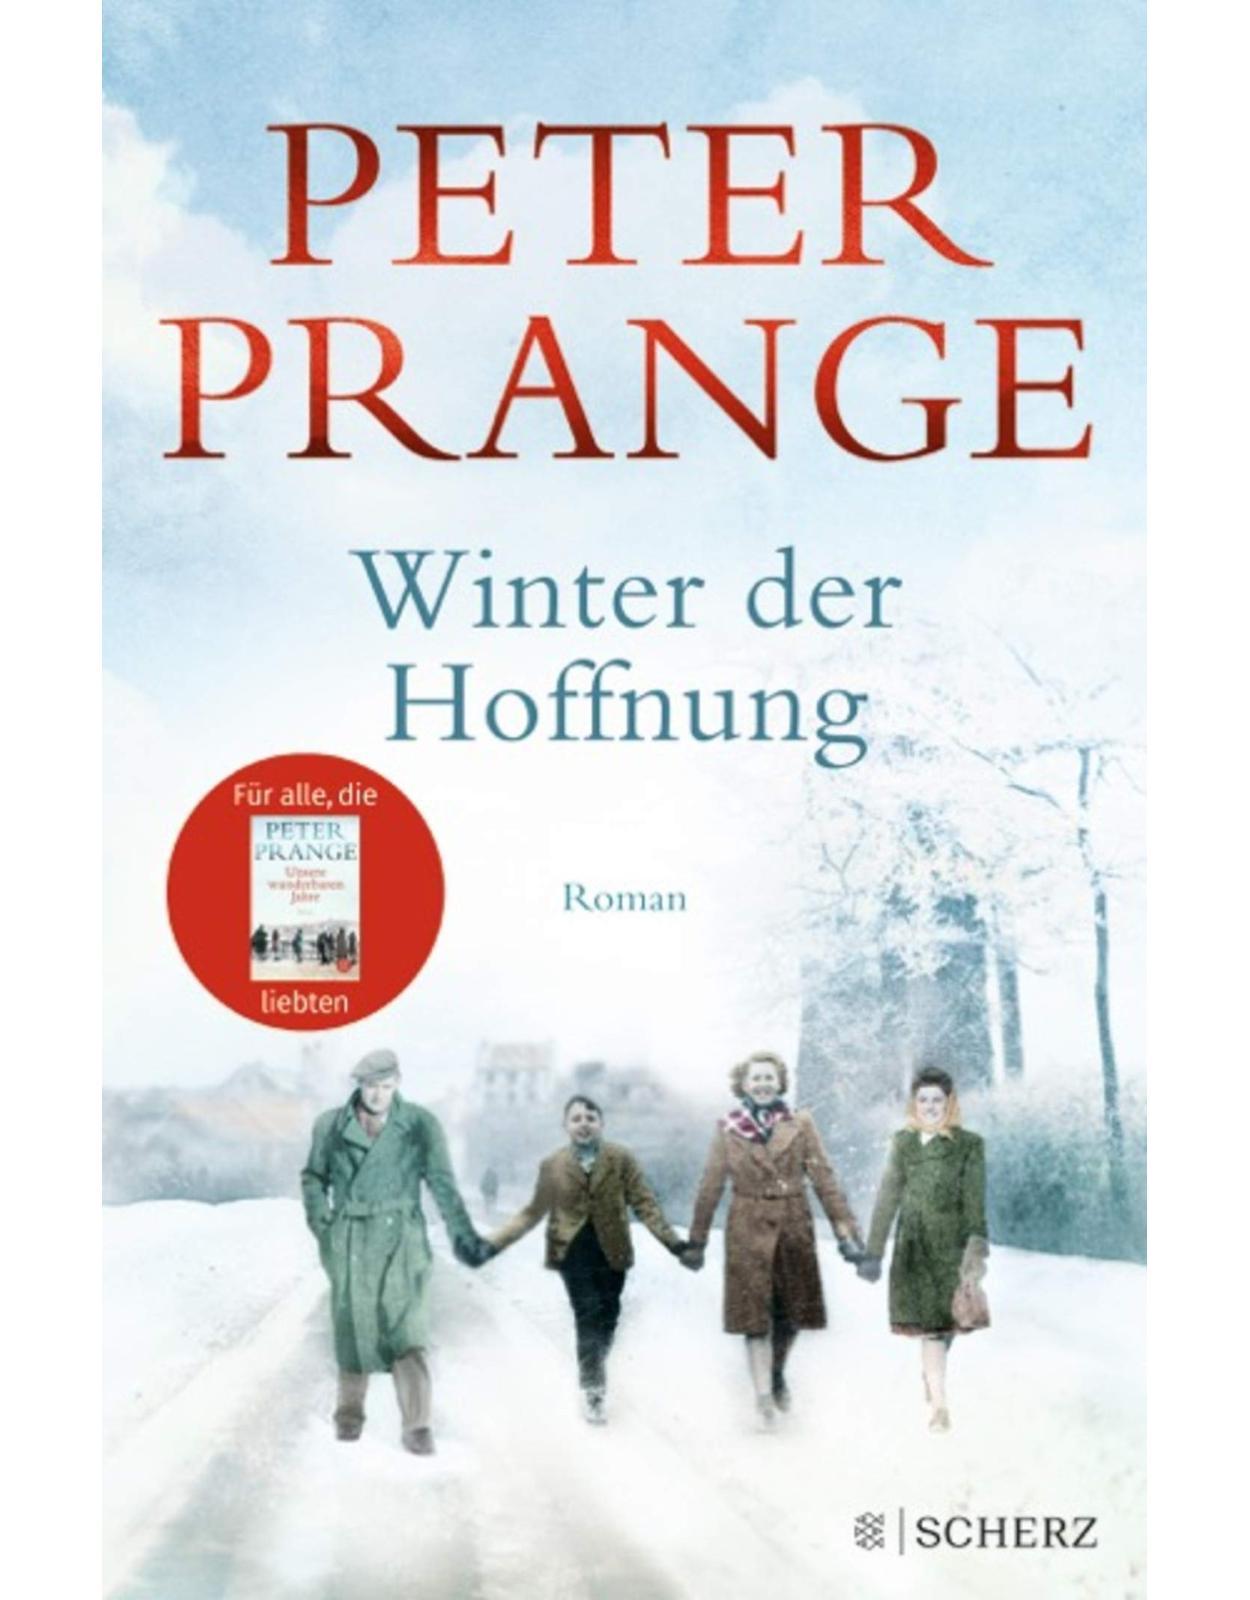 Winter der Hoffnung: Roman